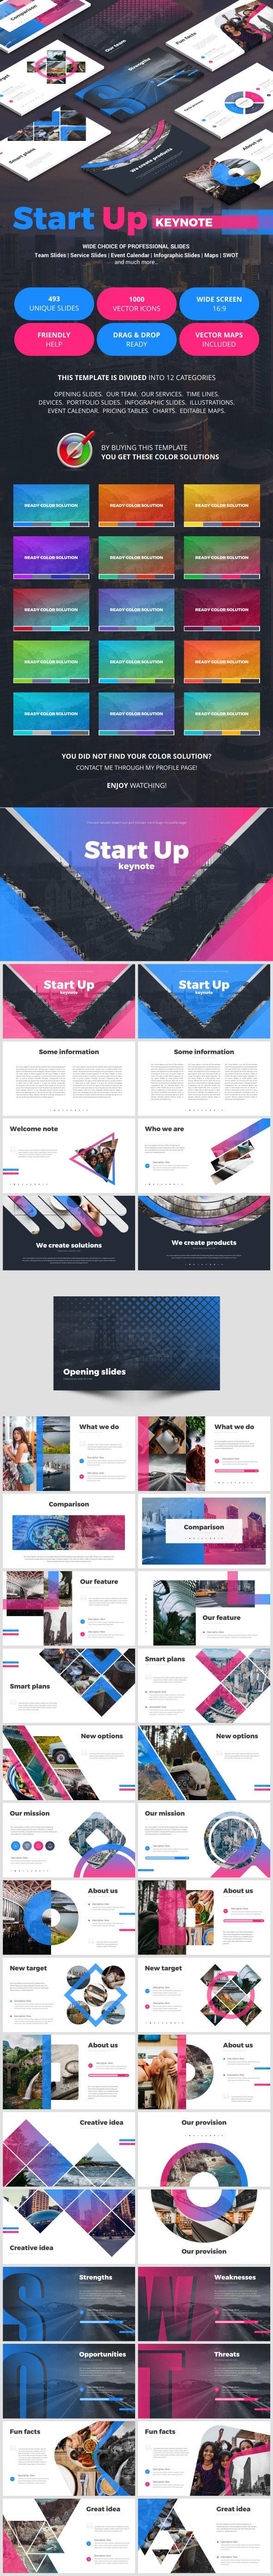 StartUp Keynote - Business Keynote Templates